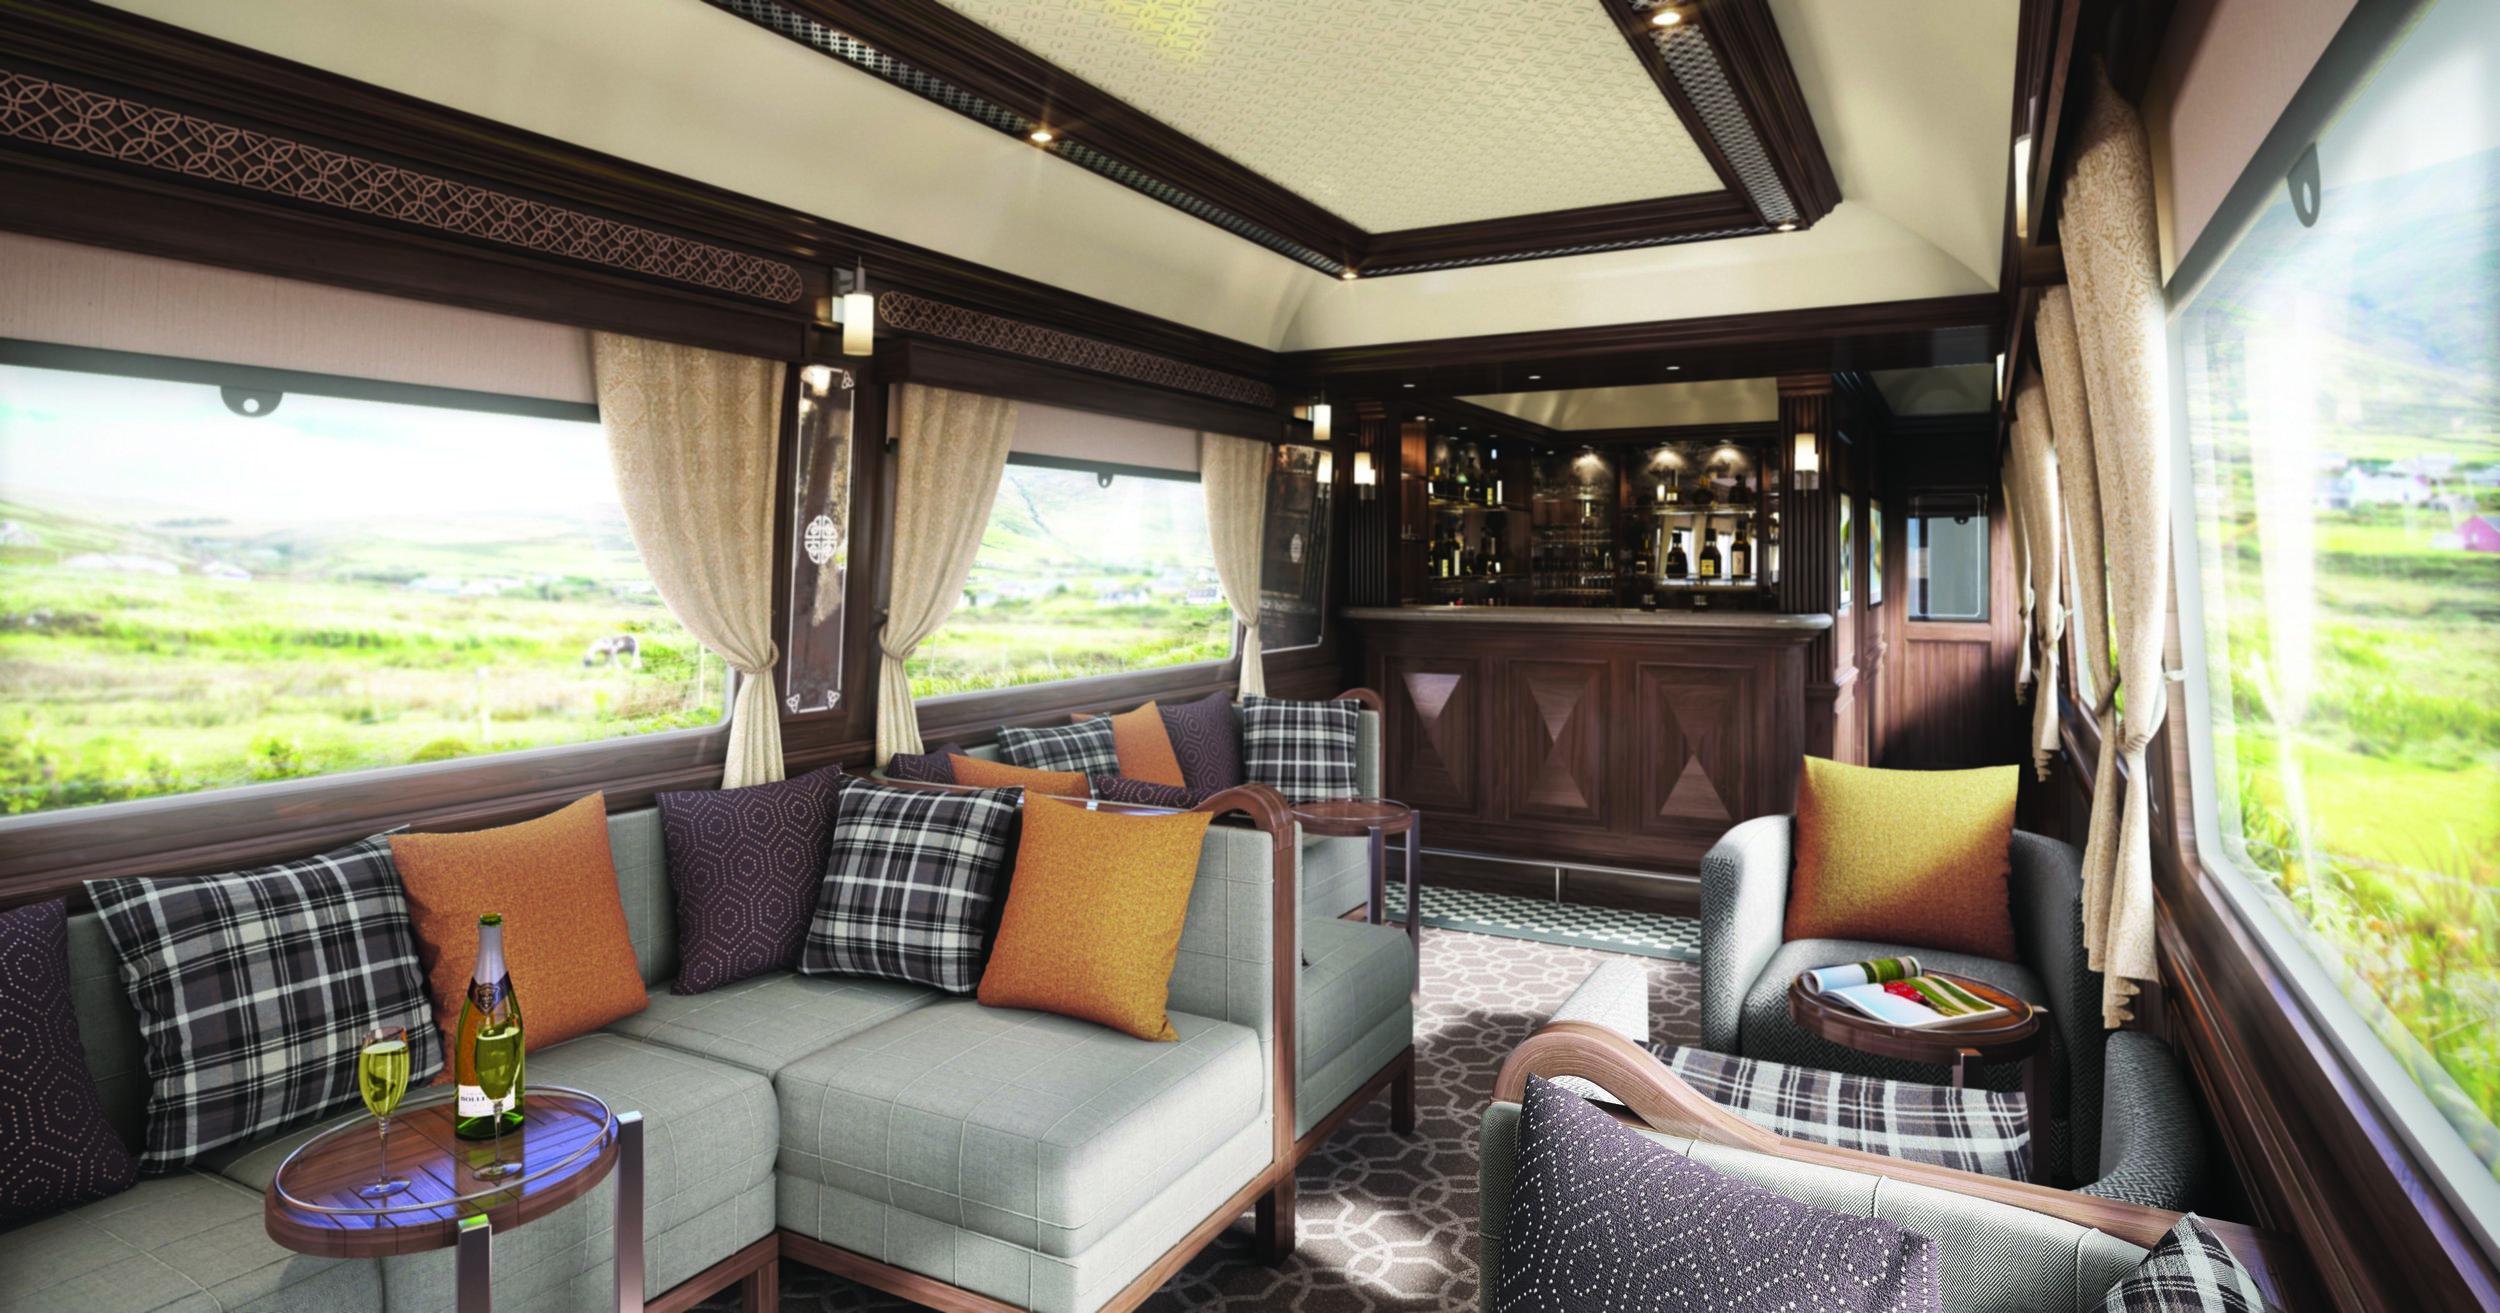 belmond-grand-hiberian-train-rendering.jpg